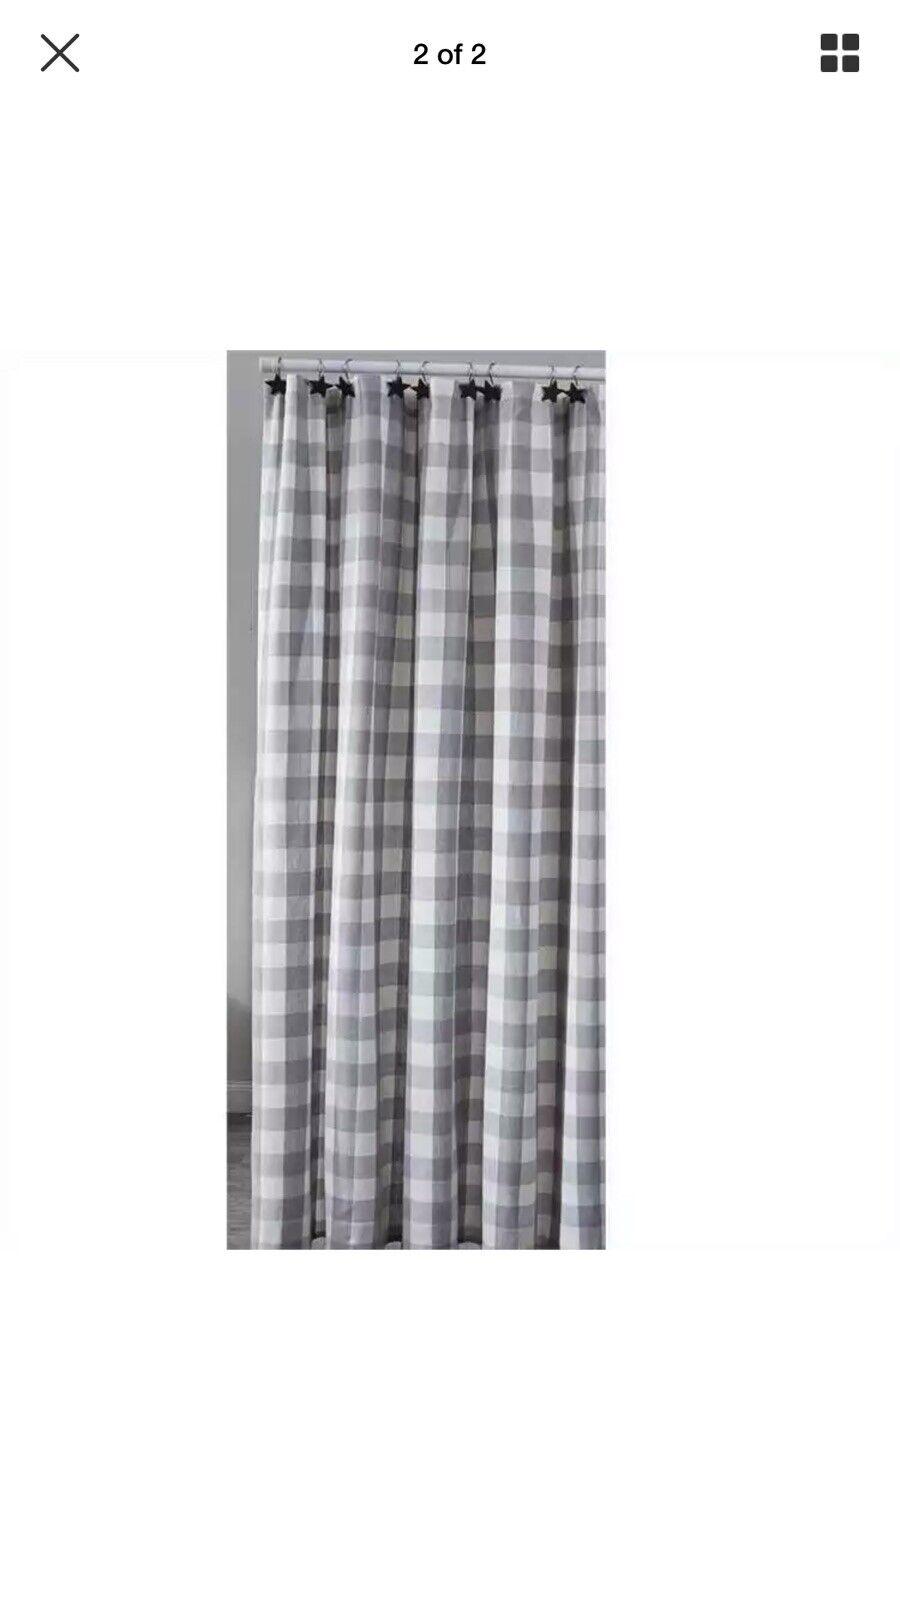 Shower Curtain Dove Gray Off White Buffalo Check Fabric Wicklow Park Designs